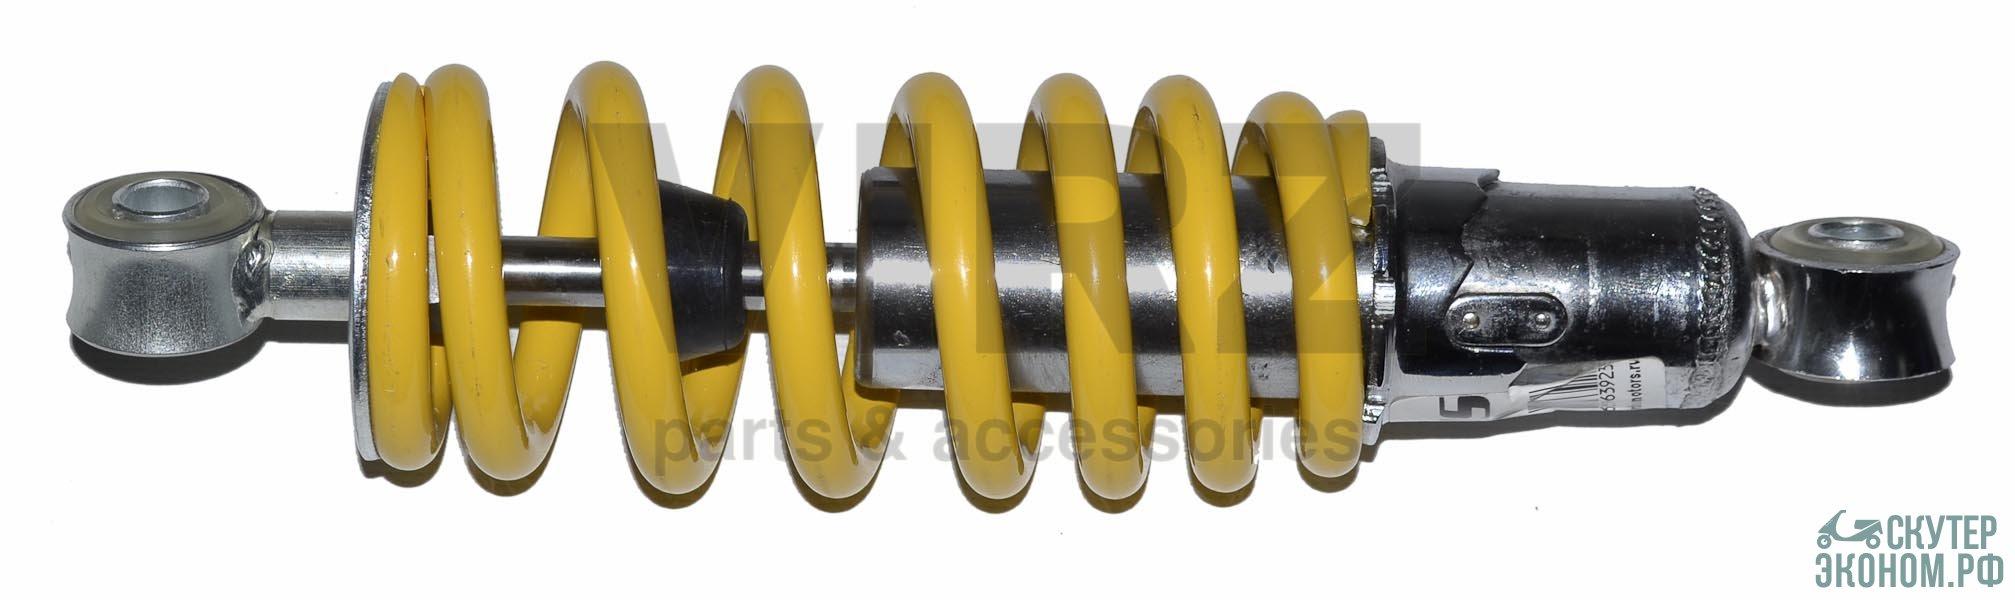 Амортизатор задний (L-245mm,D-10mm,d-10mm) ATV50-125